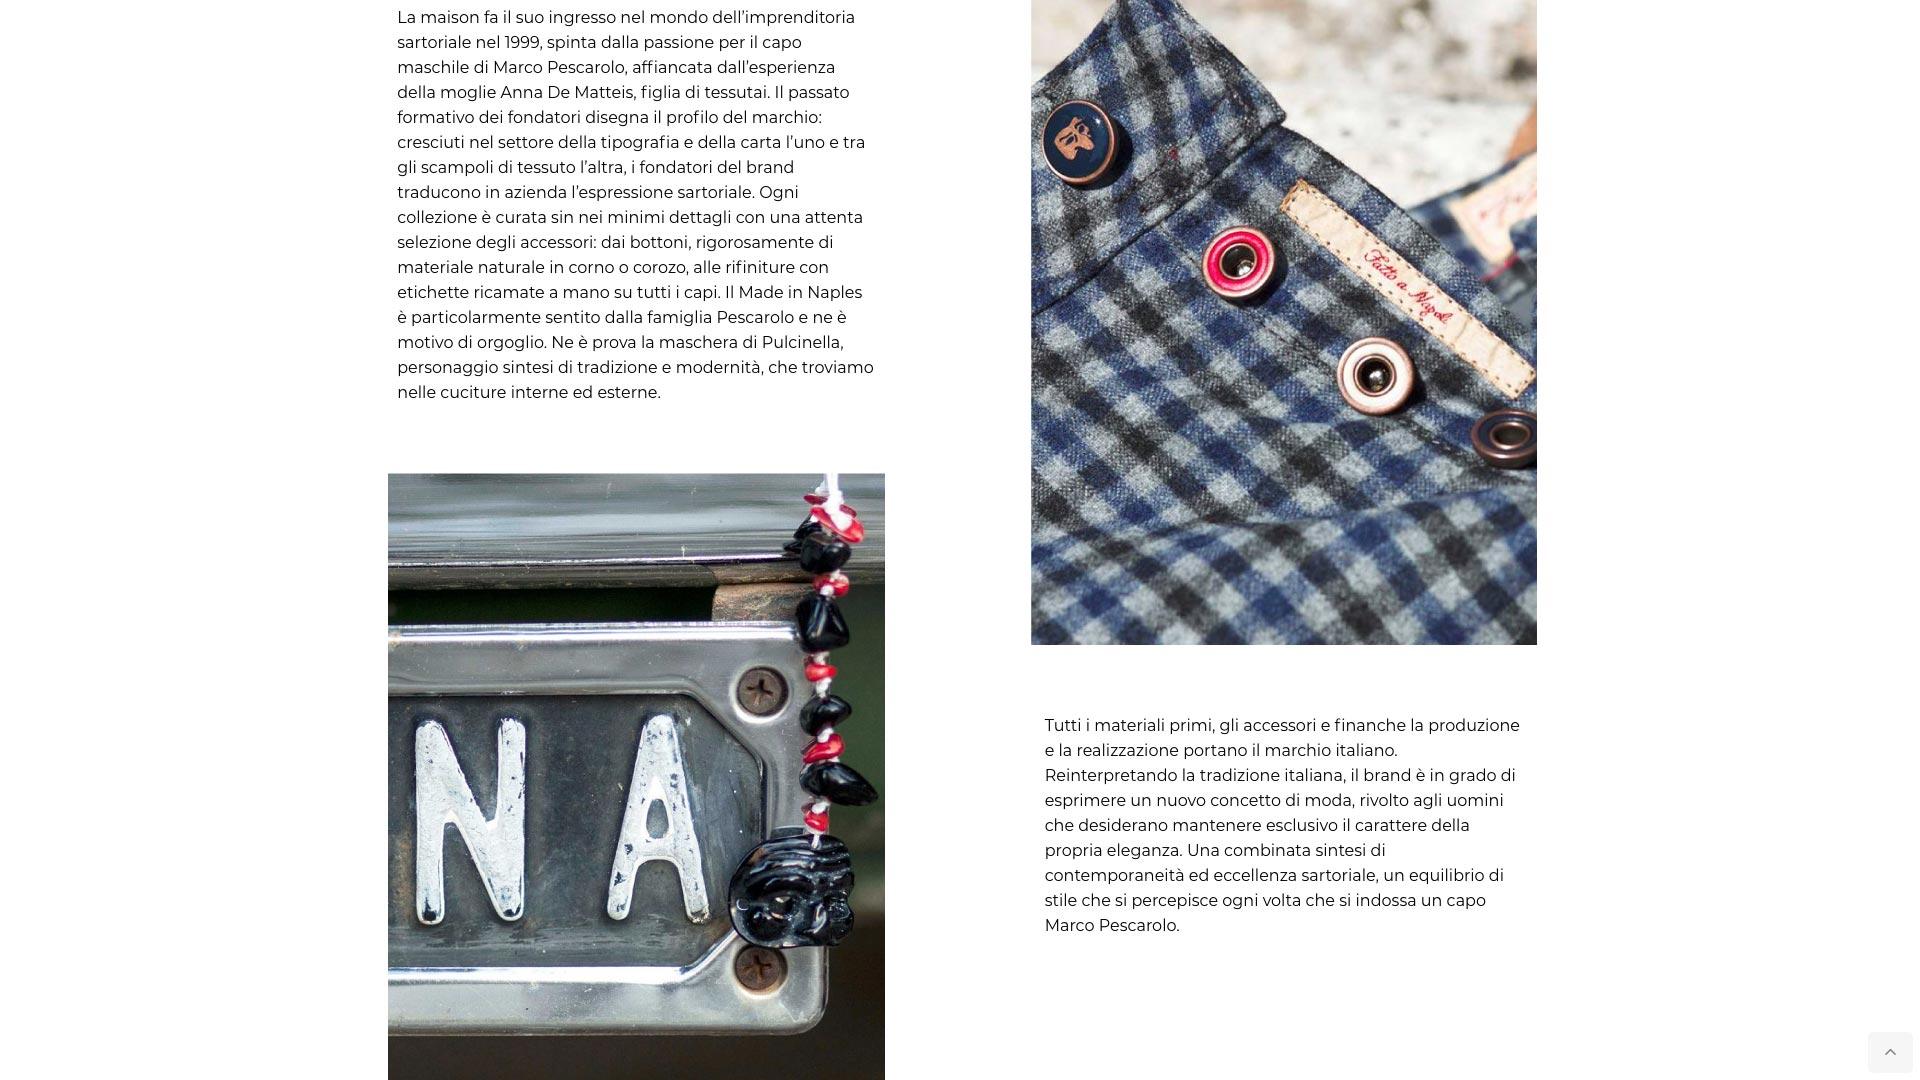 agnzia-comunicazione-napoli-roberto-guariglia-advertising-portfolio-work-fashion-marco-pescarolo-napoli-kiton-sartorio-pantaloni-sartoria-sito-web-3.jpg